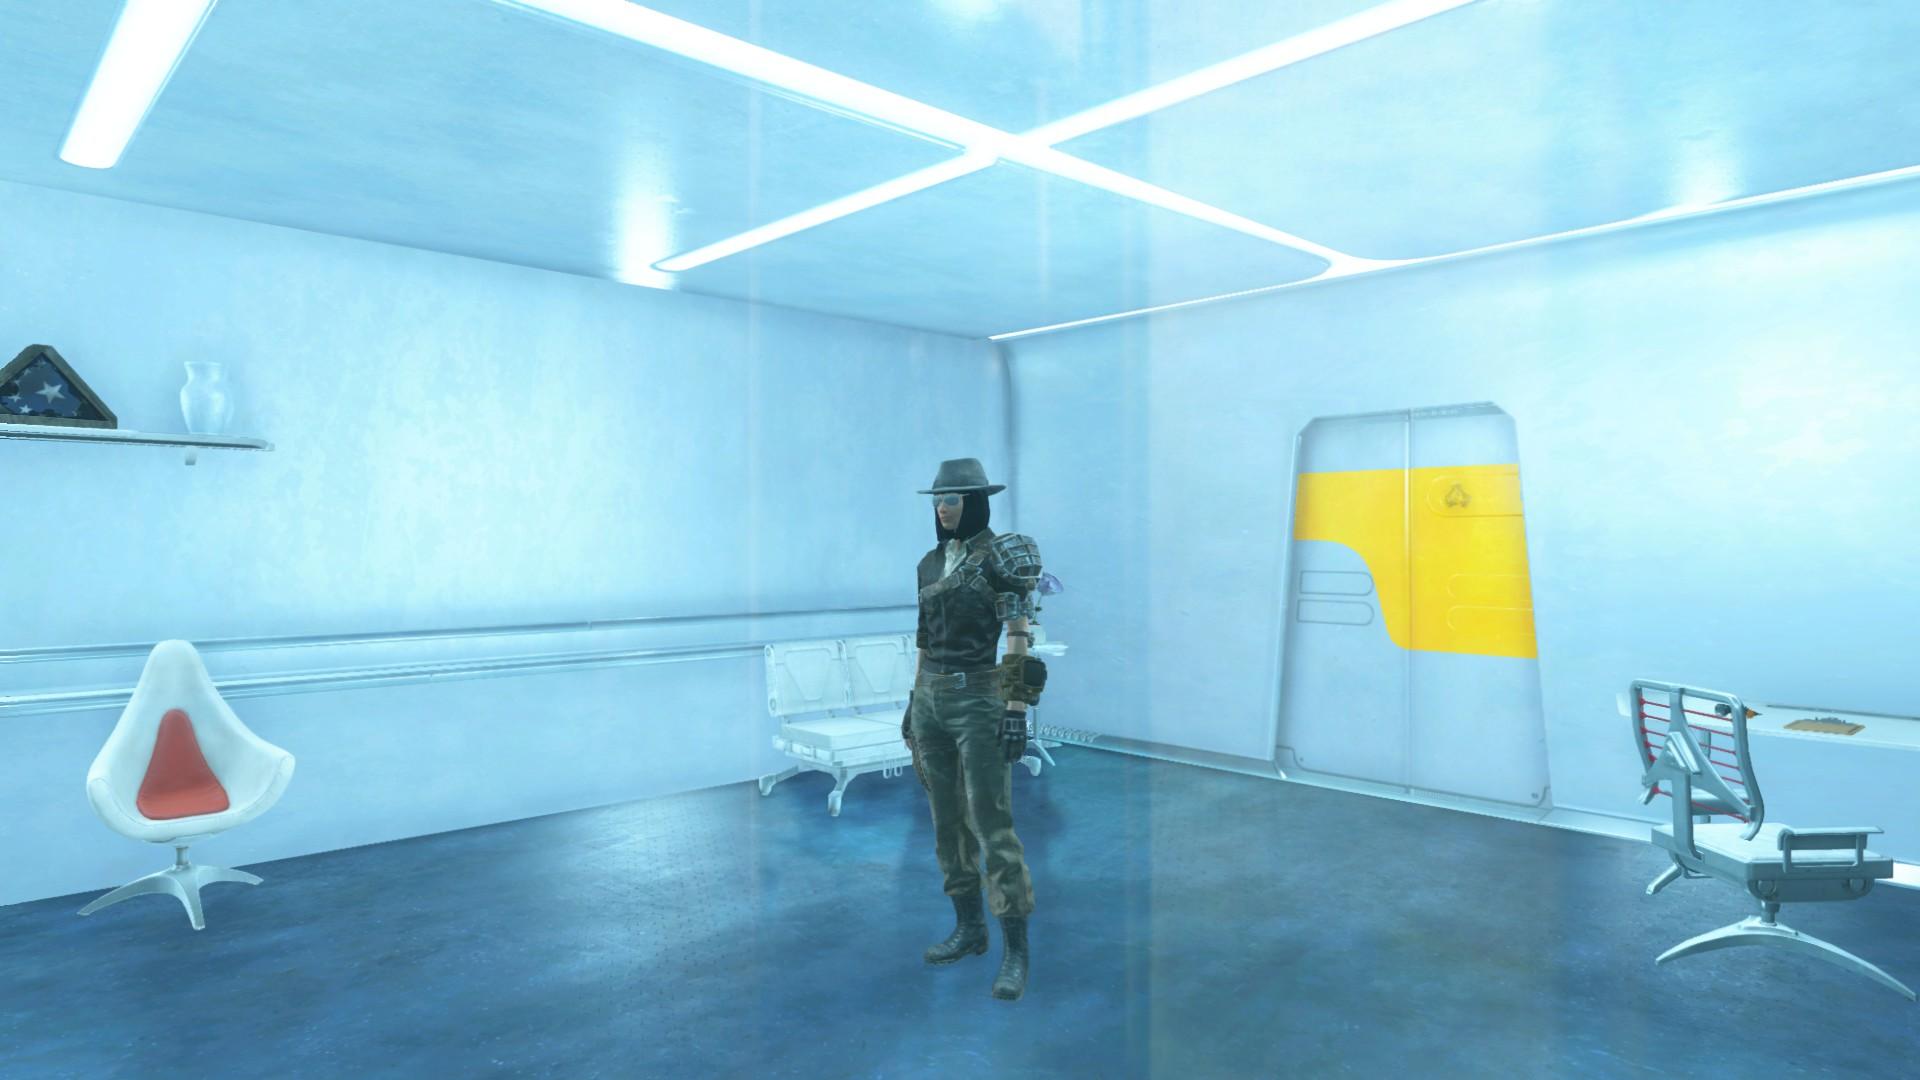 20170826145223_1.jpg - Fallout 4